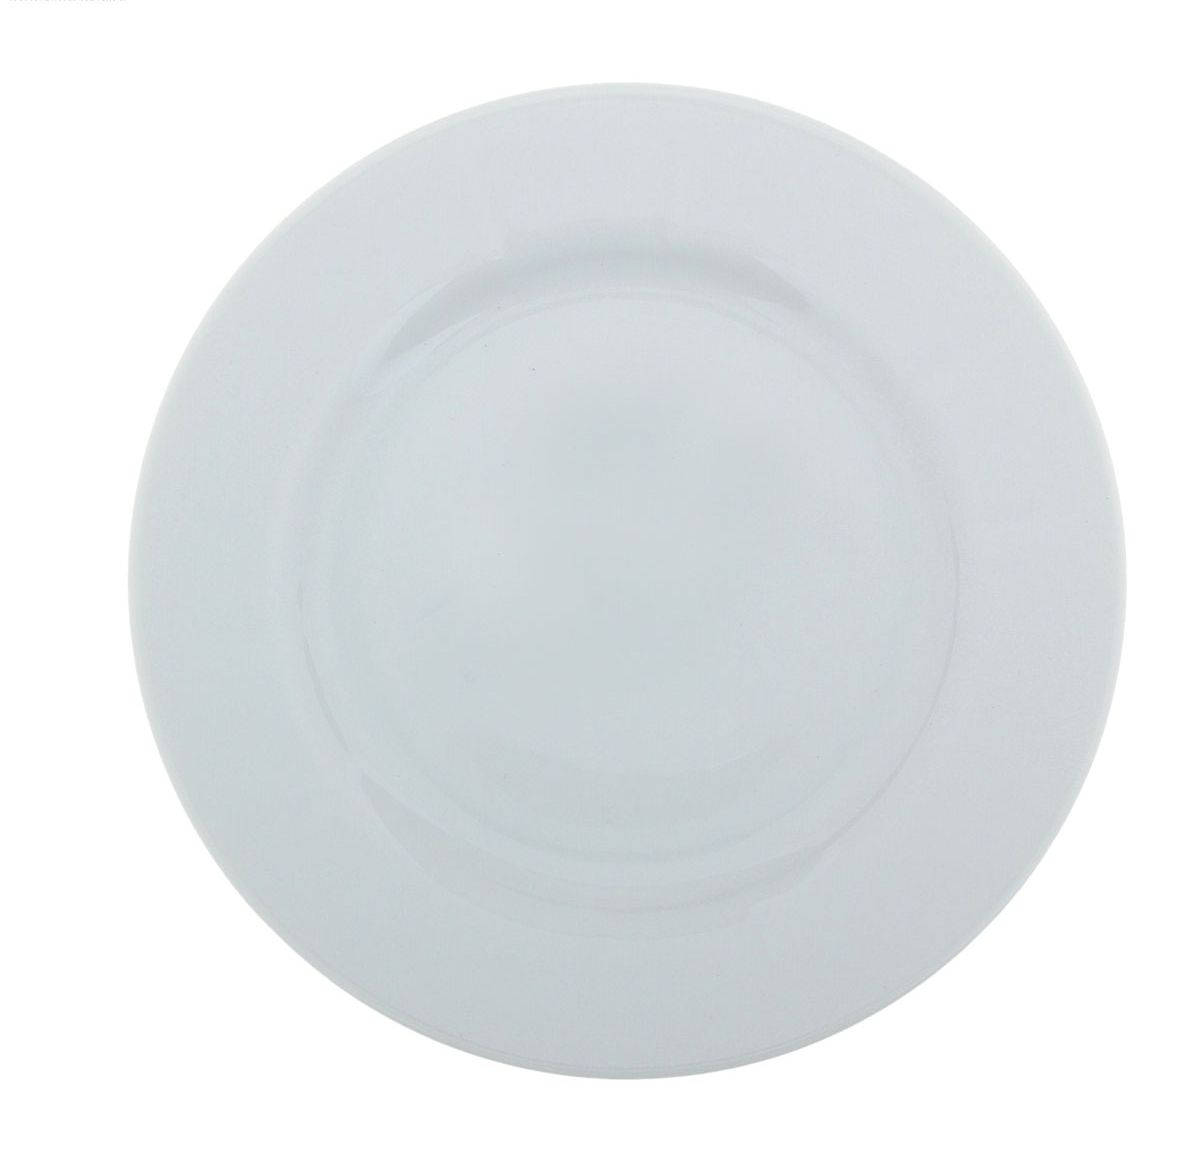 Тарелка мелкая Идиллия. Белье, диаметр 17 см тарелка мелкая идиллия ромашка диаметр 20 см 5с0189